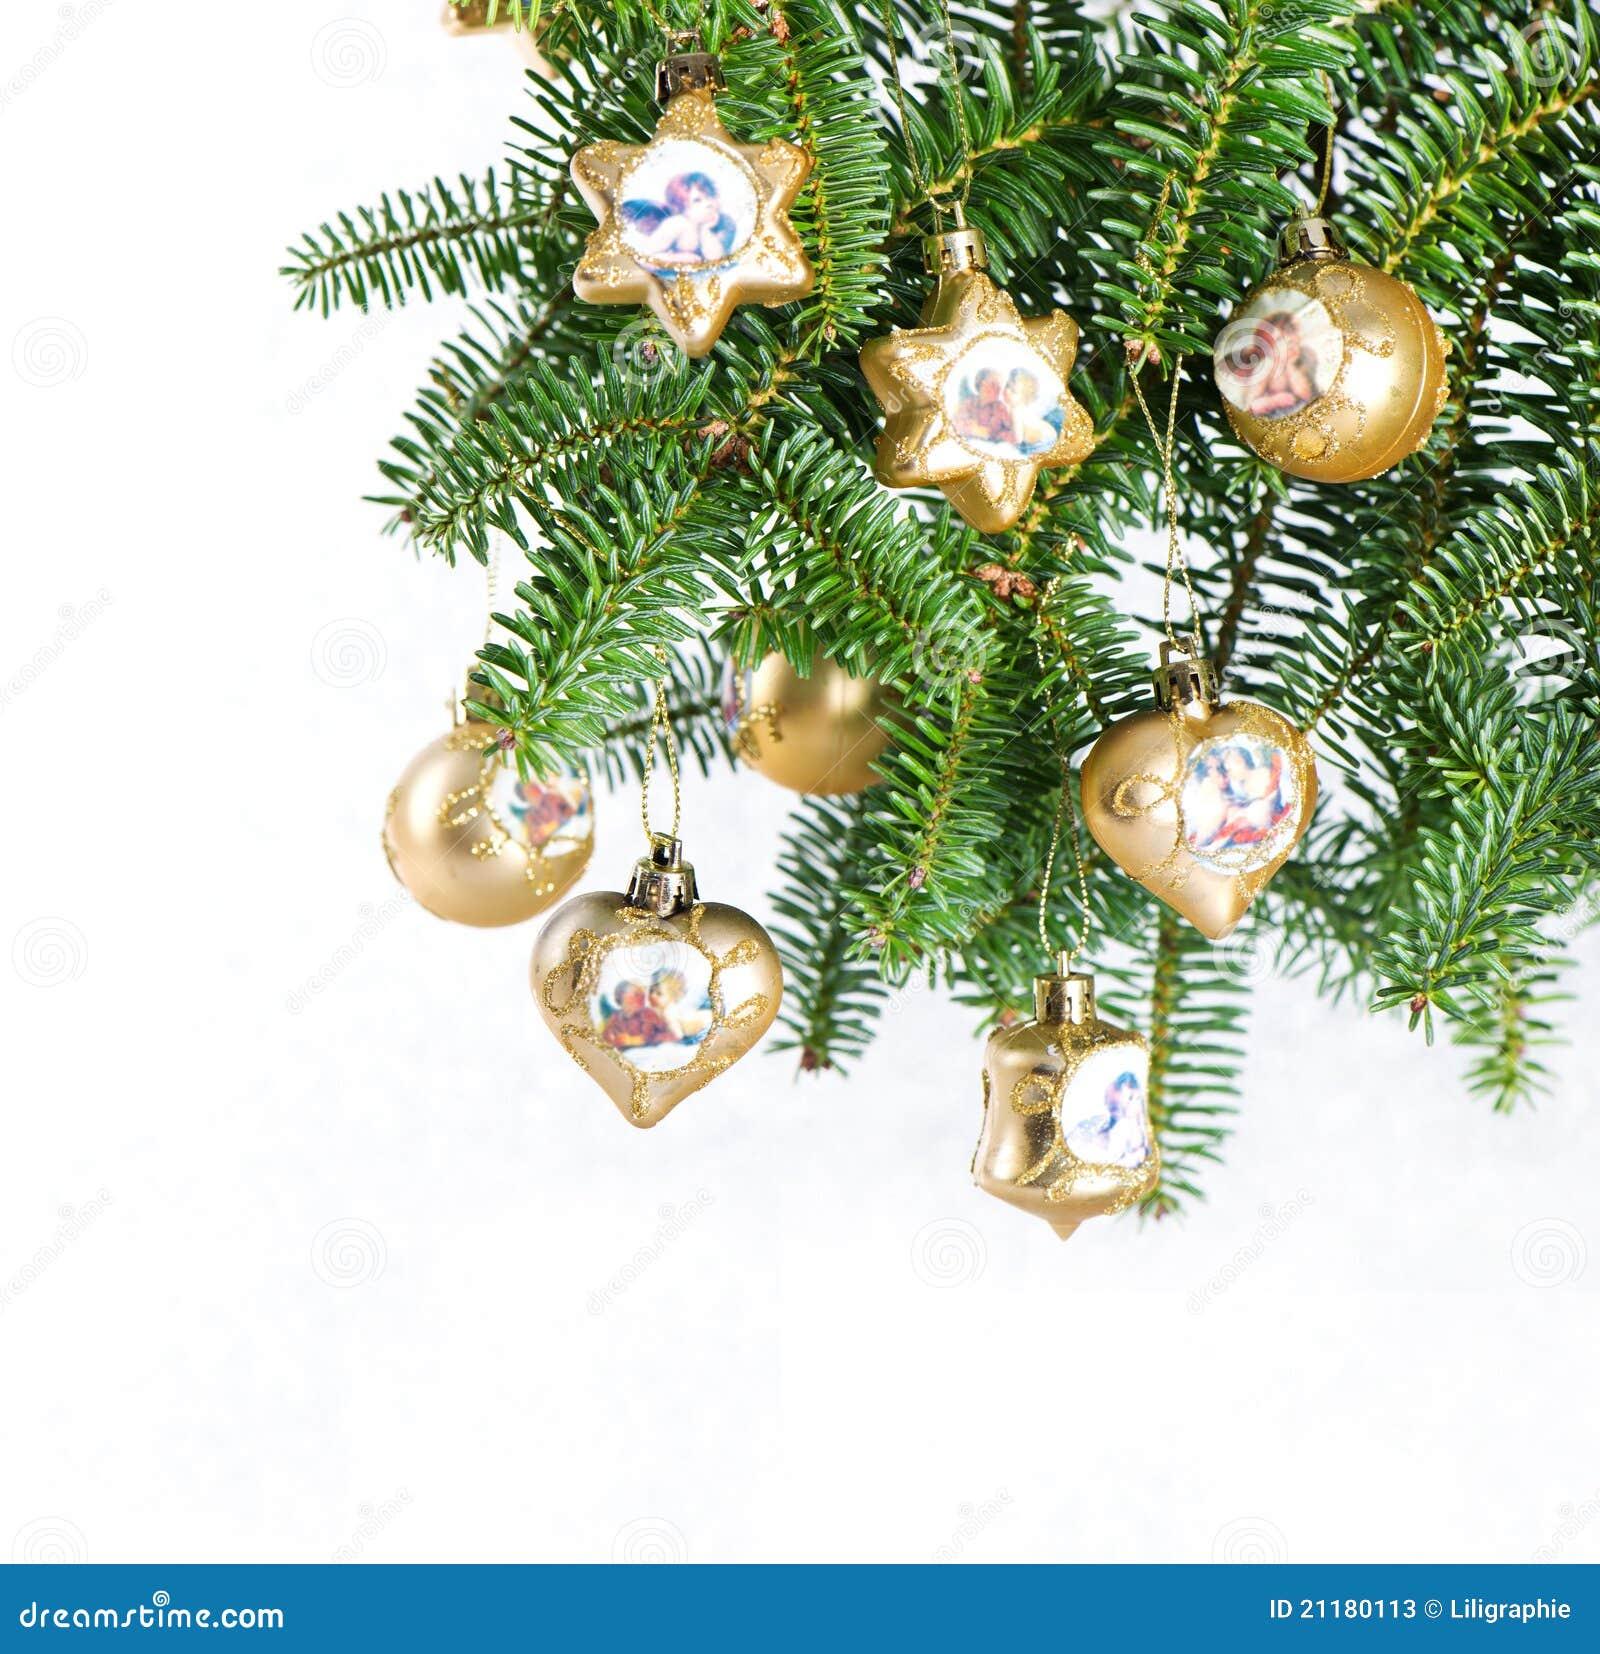 Christmas tree decoration. vinrage balls